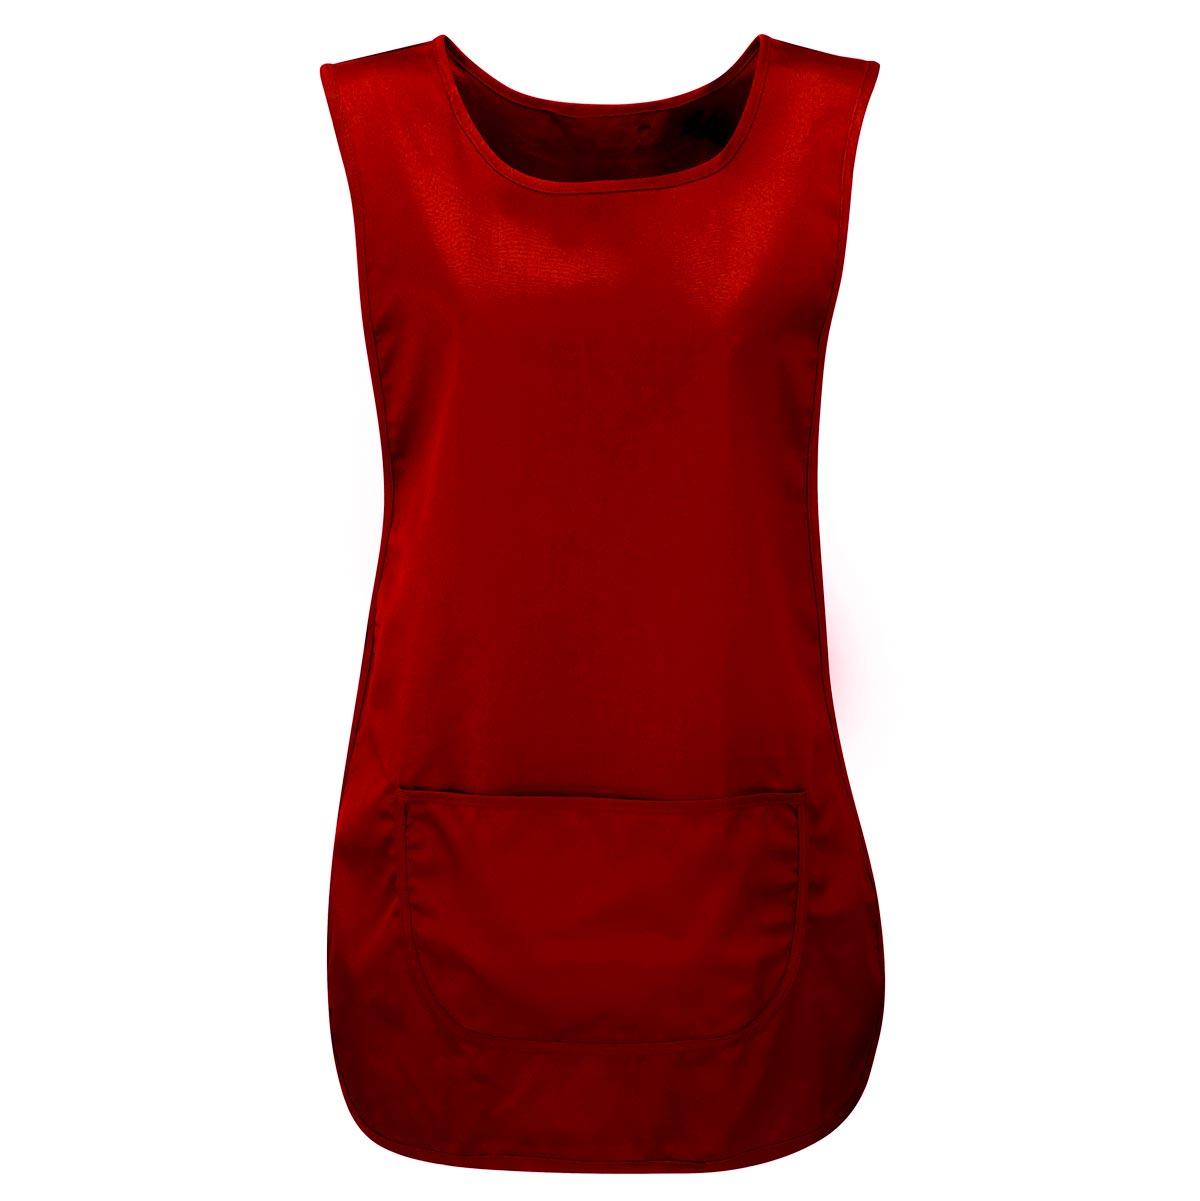 Standard Tabard With Pocket - WTAAB1-CTAB1-red